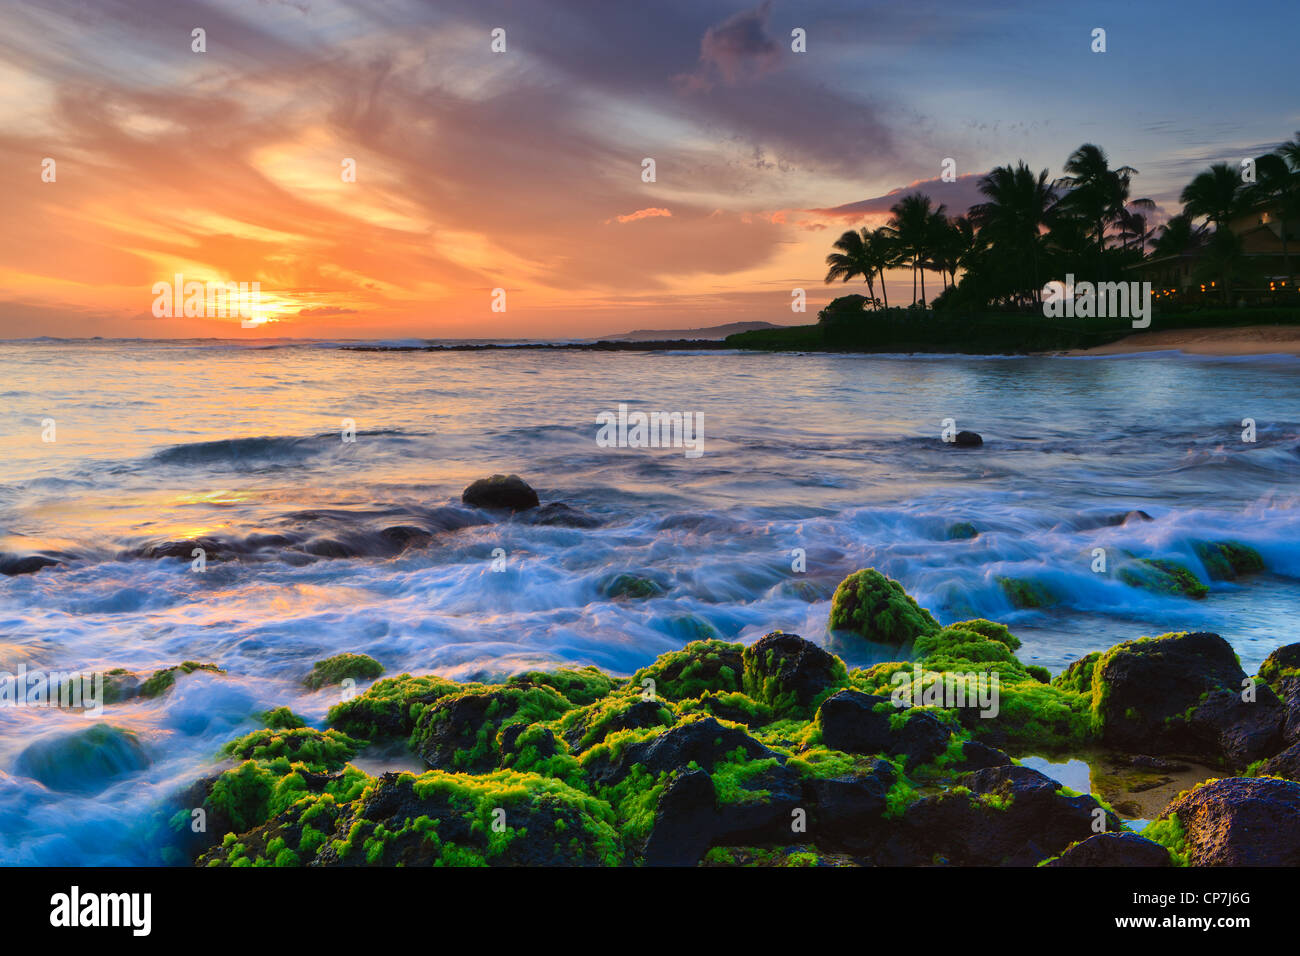 Tramonto al famoso Poipu Beach, Kauai, Hawaii Immagini Stock